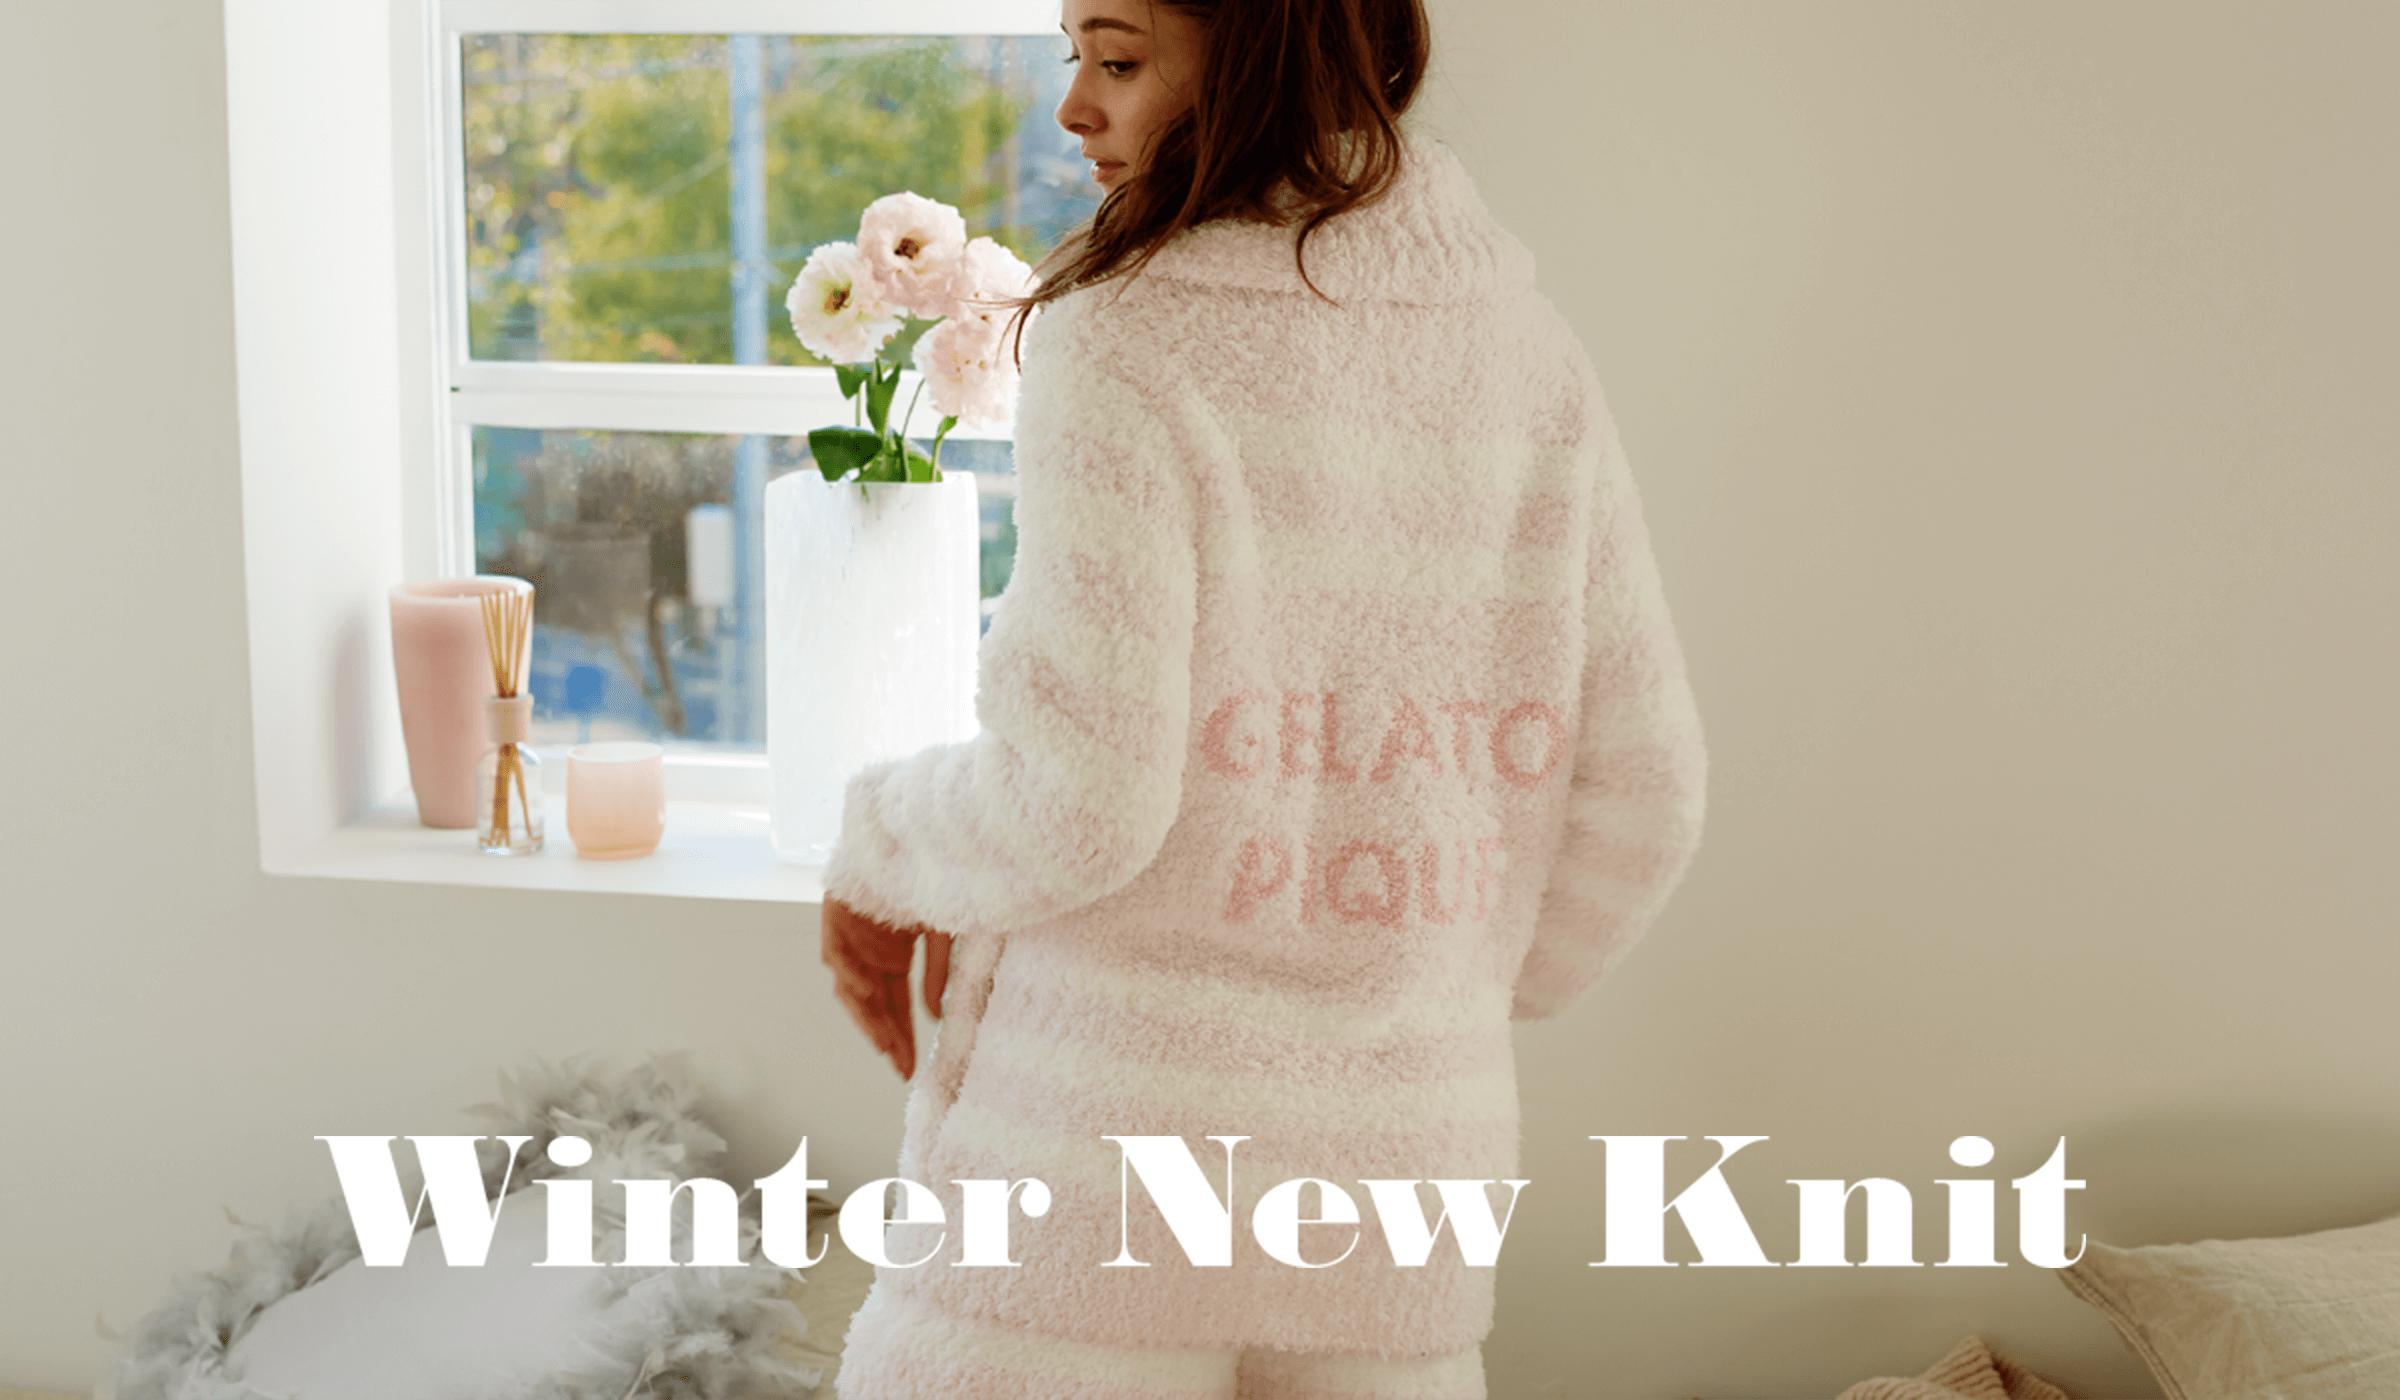 Winter New Knit